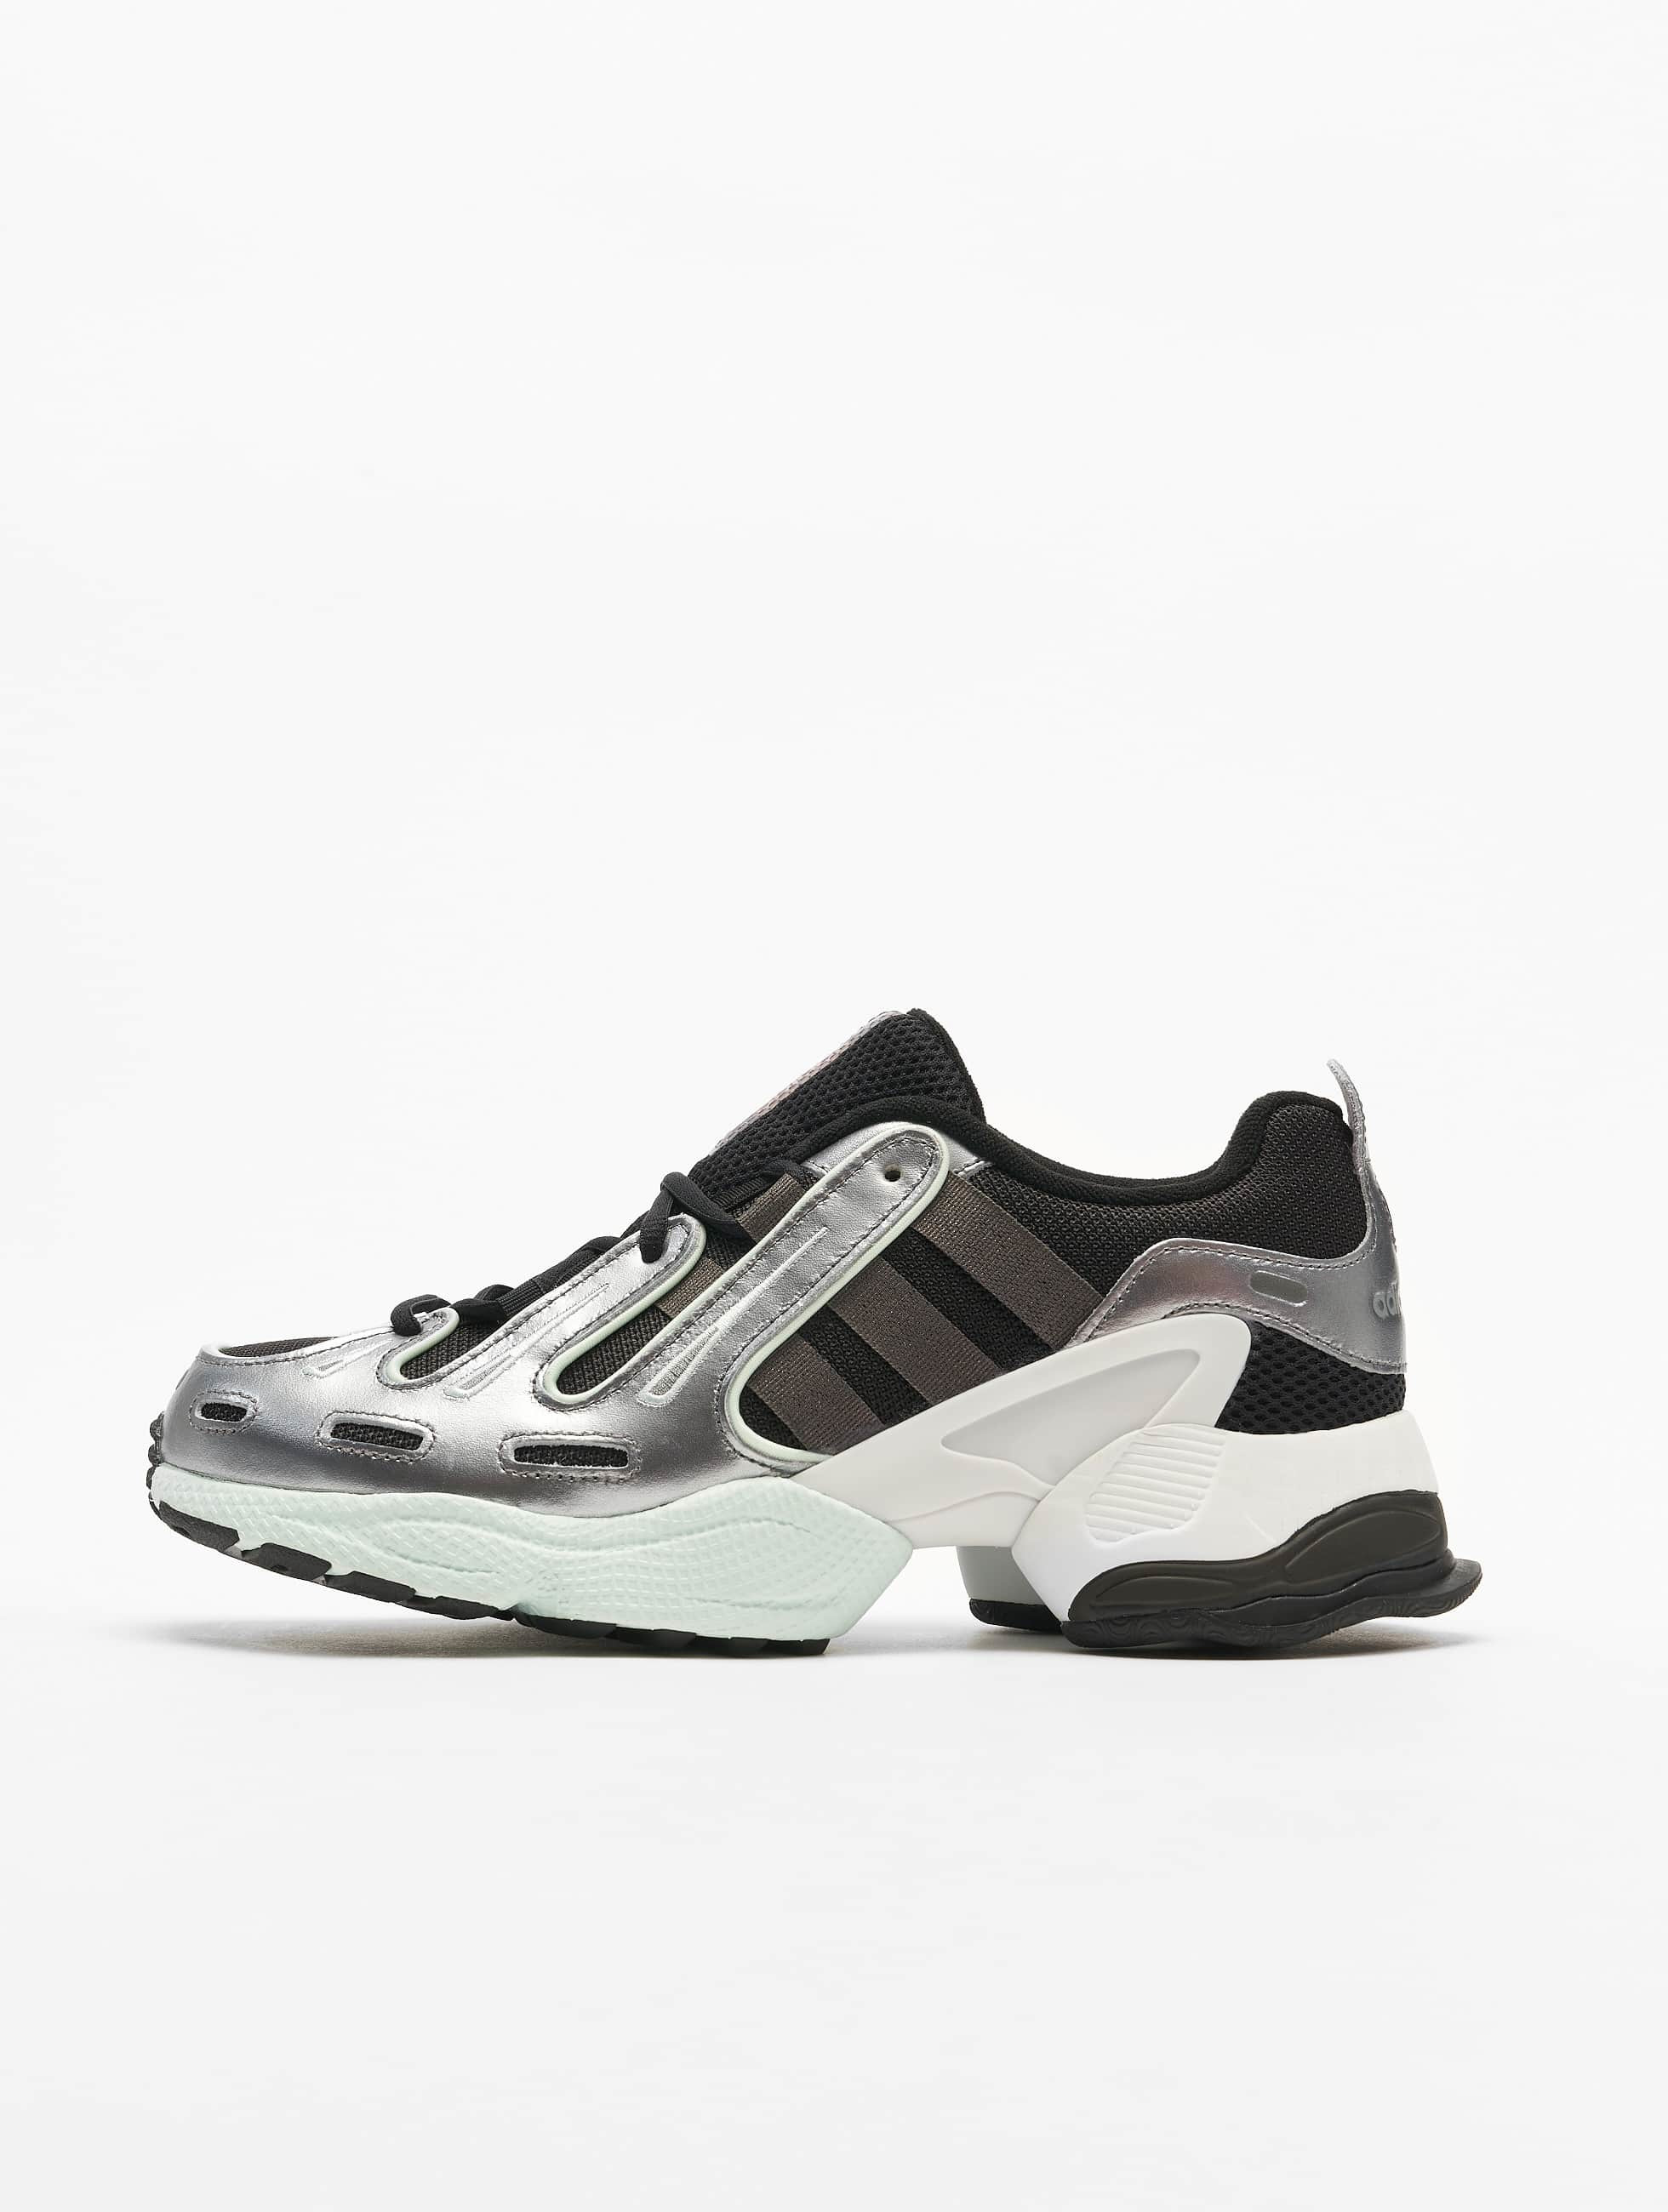 adidas Originals schoen sneaker EQT Gazelle in zwart 692952